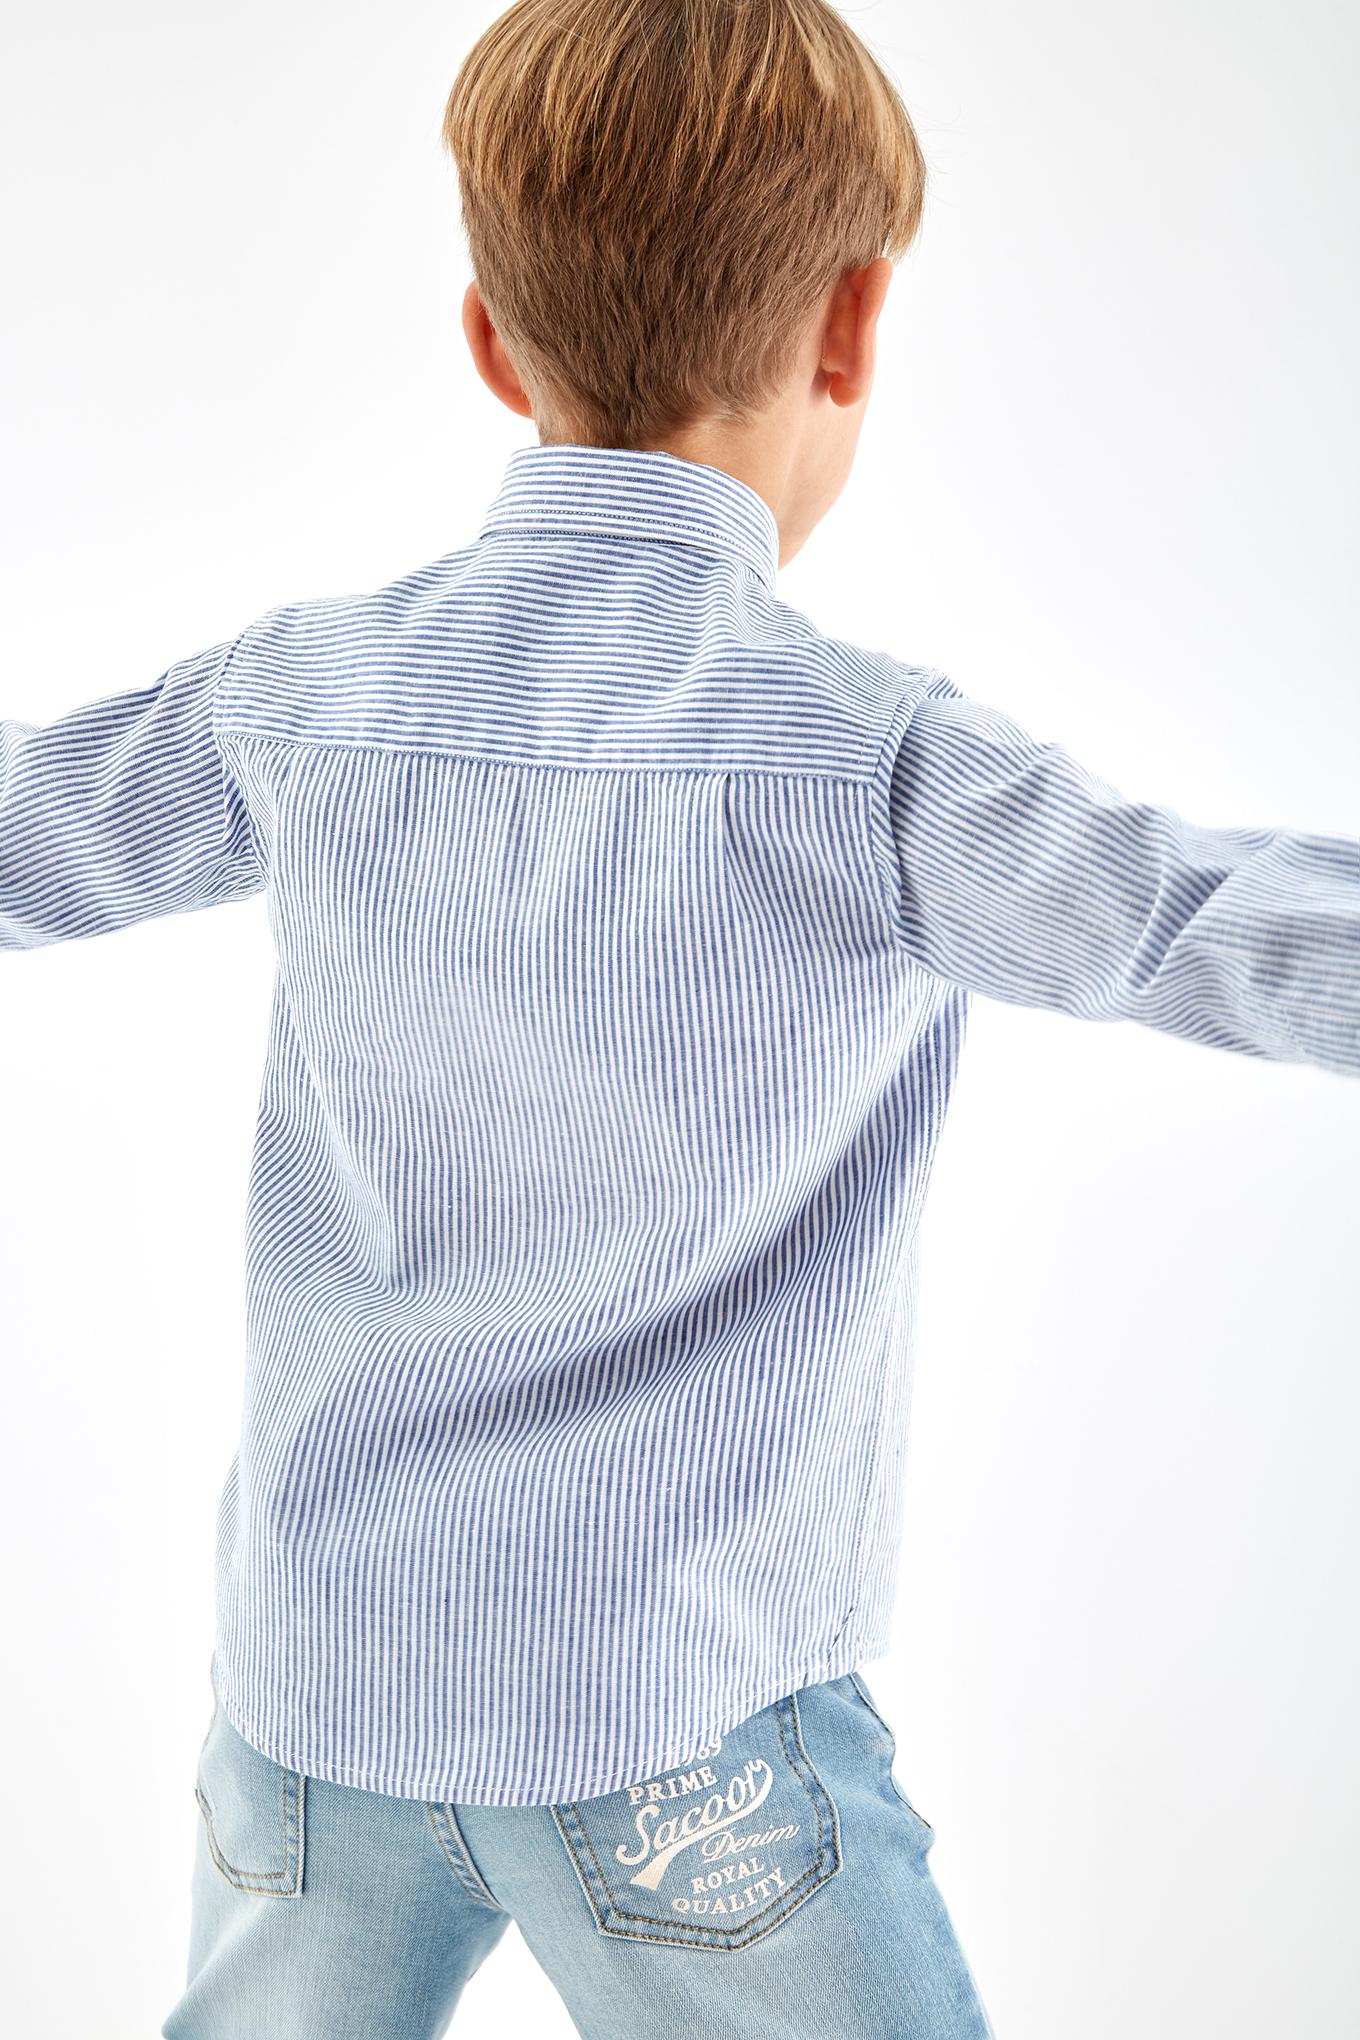 Shirt Blue Casual Boy